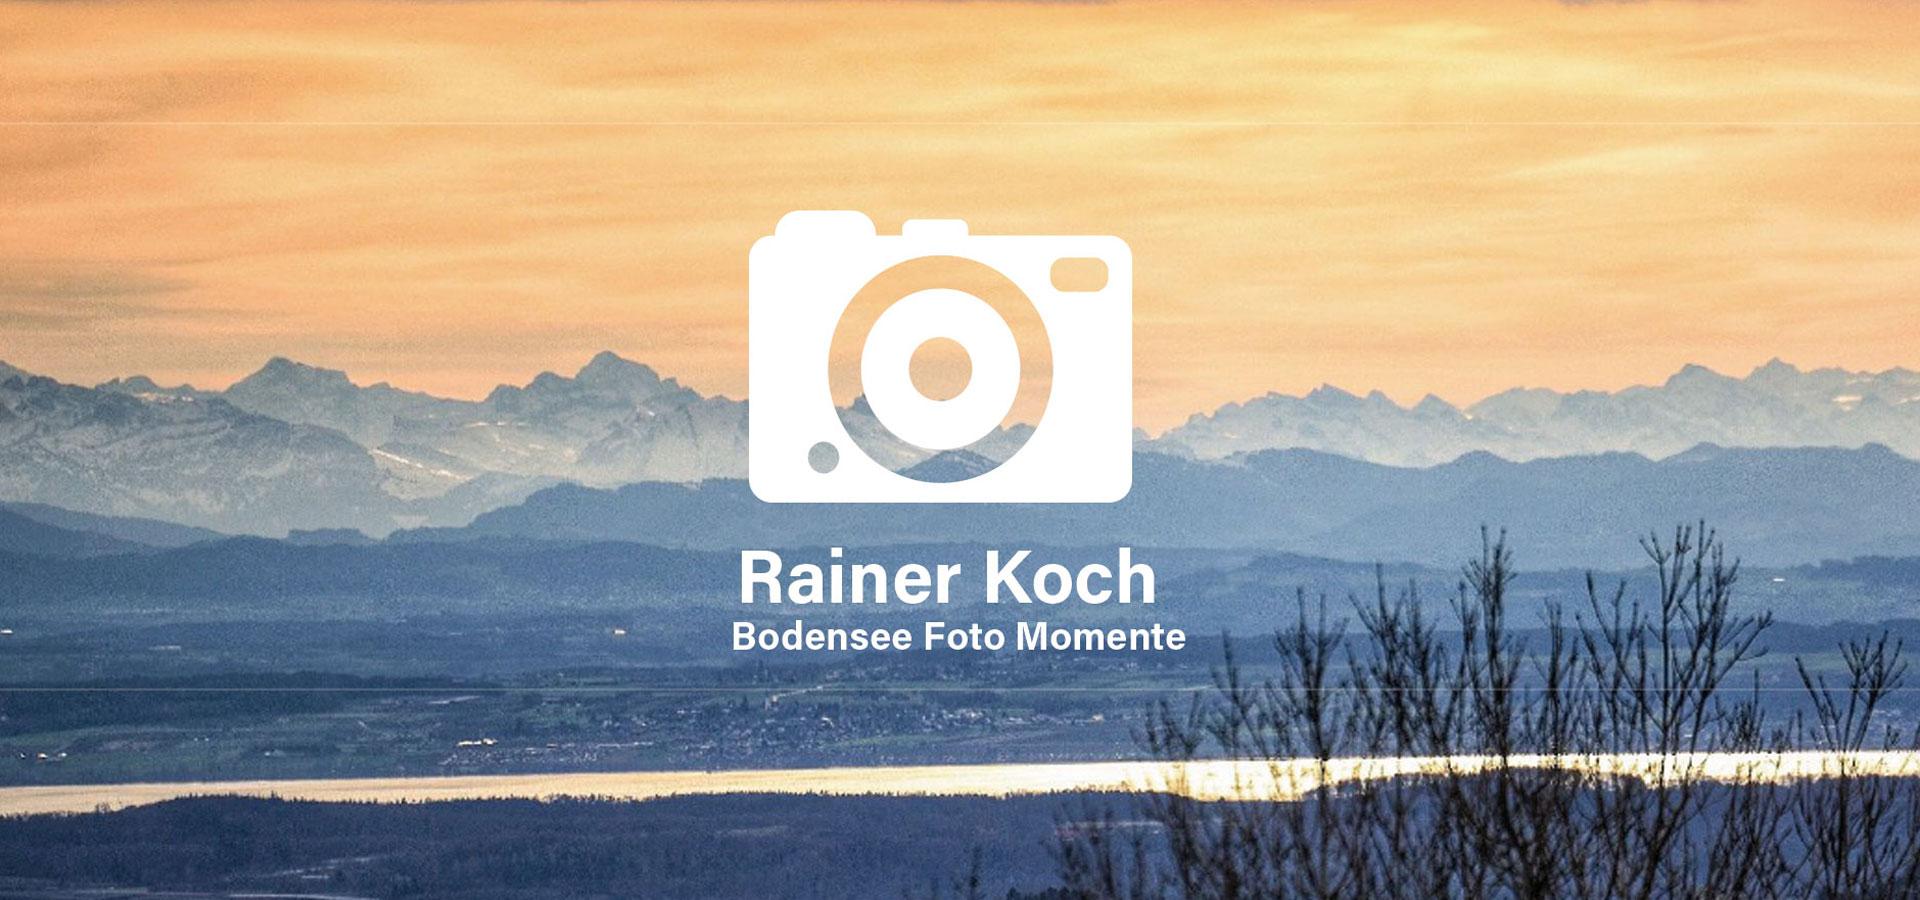 rainer-koch-bodenseefotomomente-fotografie-hochzeit-car-portrait-fasnet_01.jpg